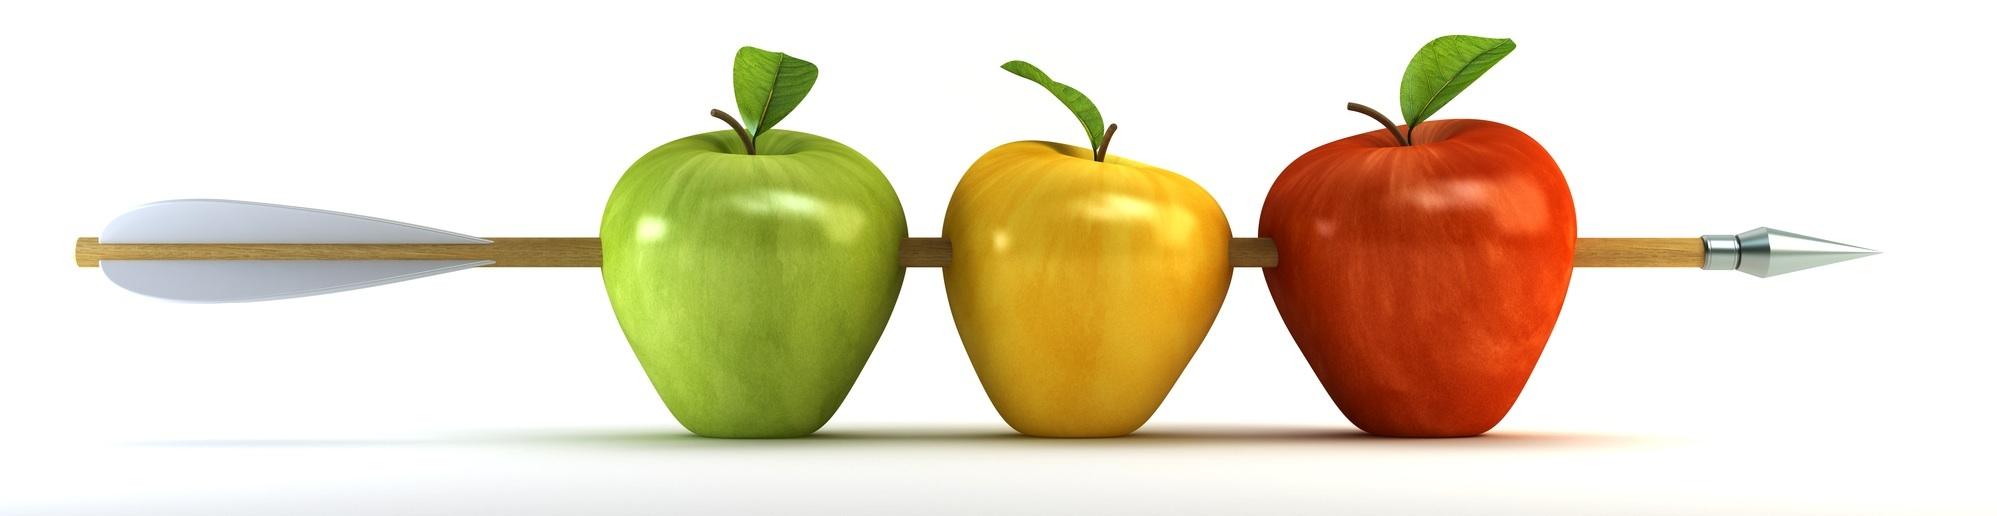 3d scene with pierced apples by arrow